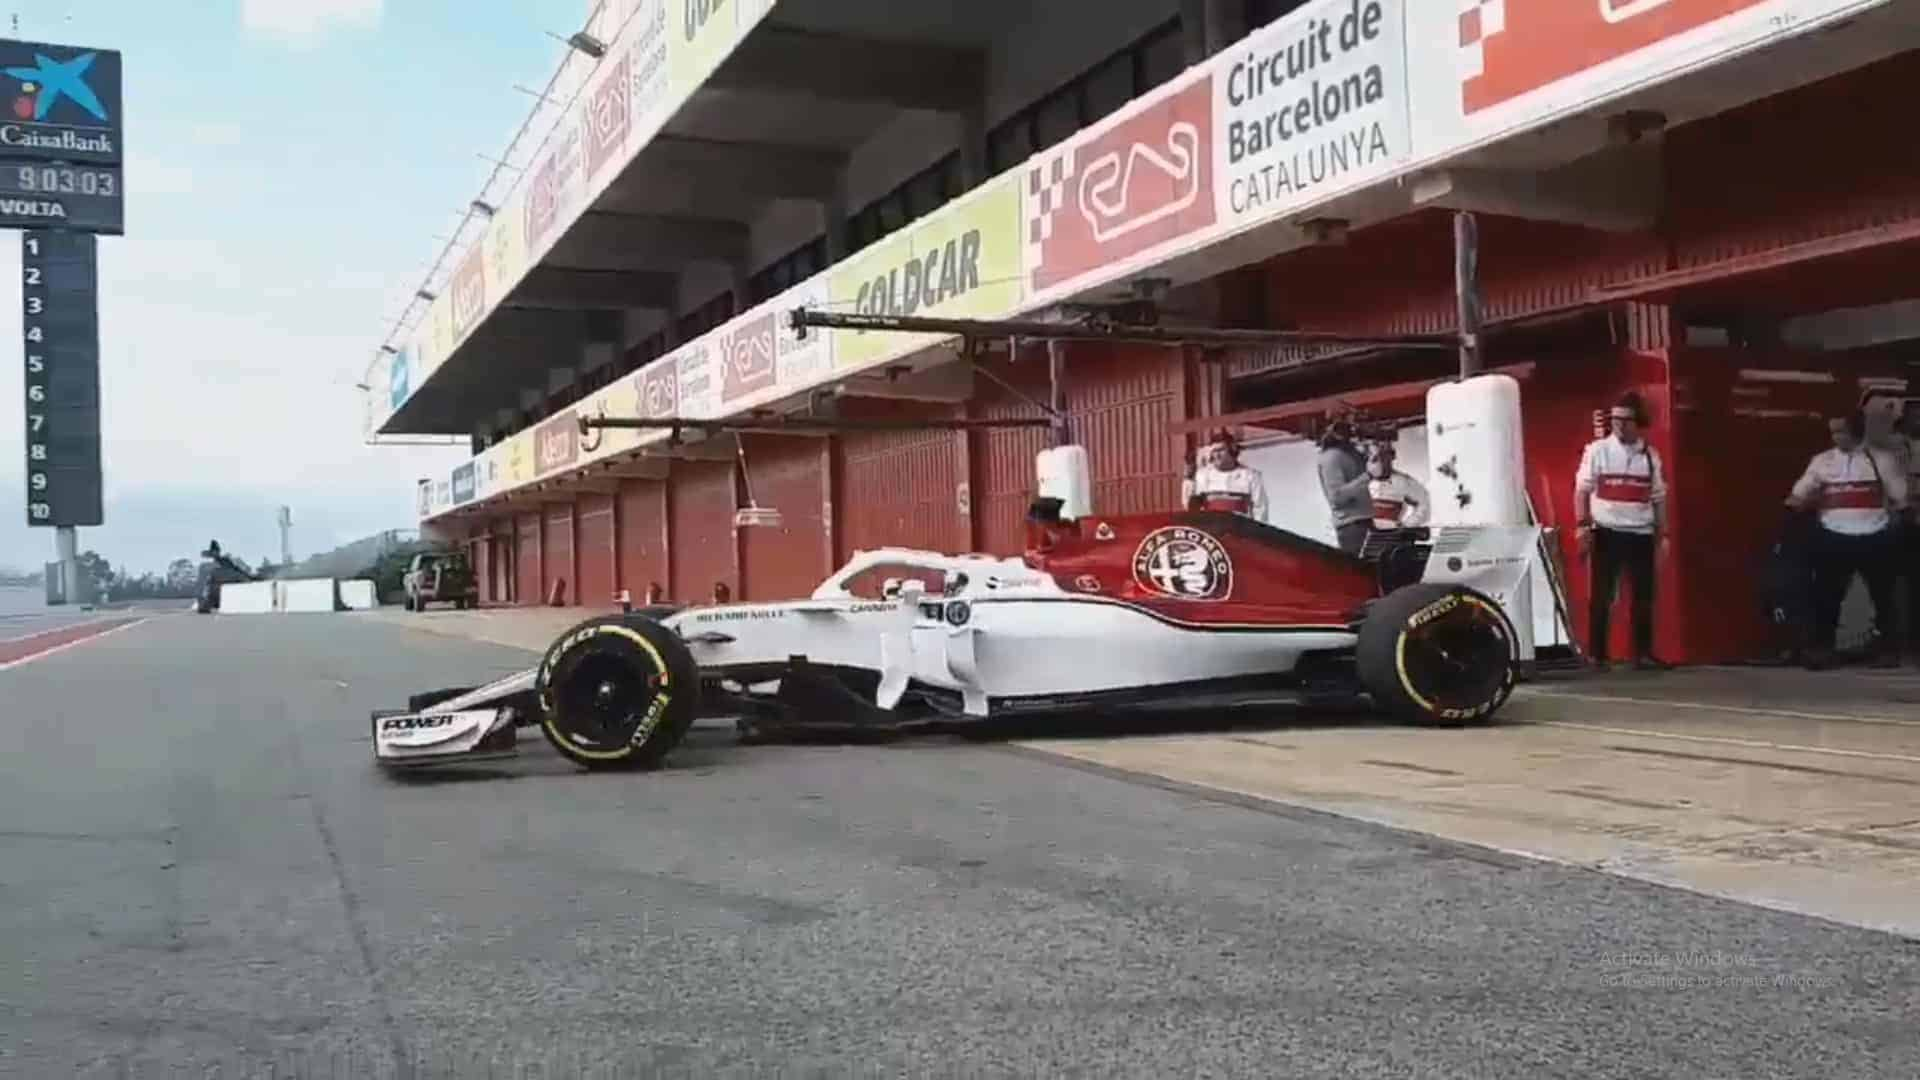 Old Time Car Wallpaper Hd New Ferrari 2018 F1 Engine Hits The Track In New Alfa